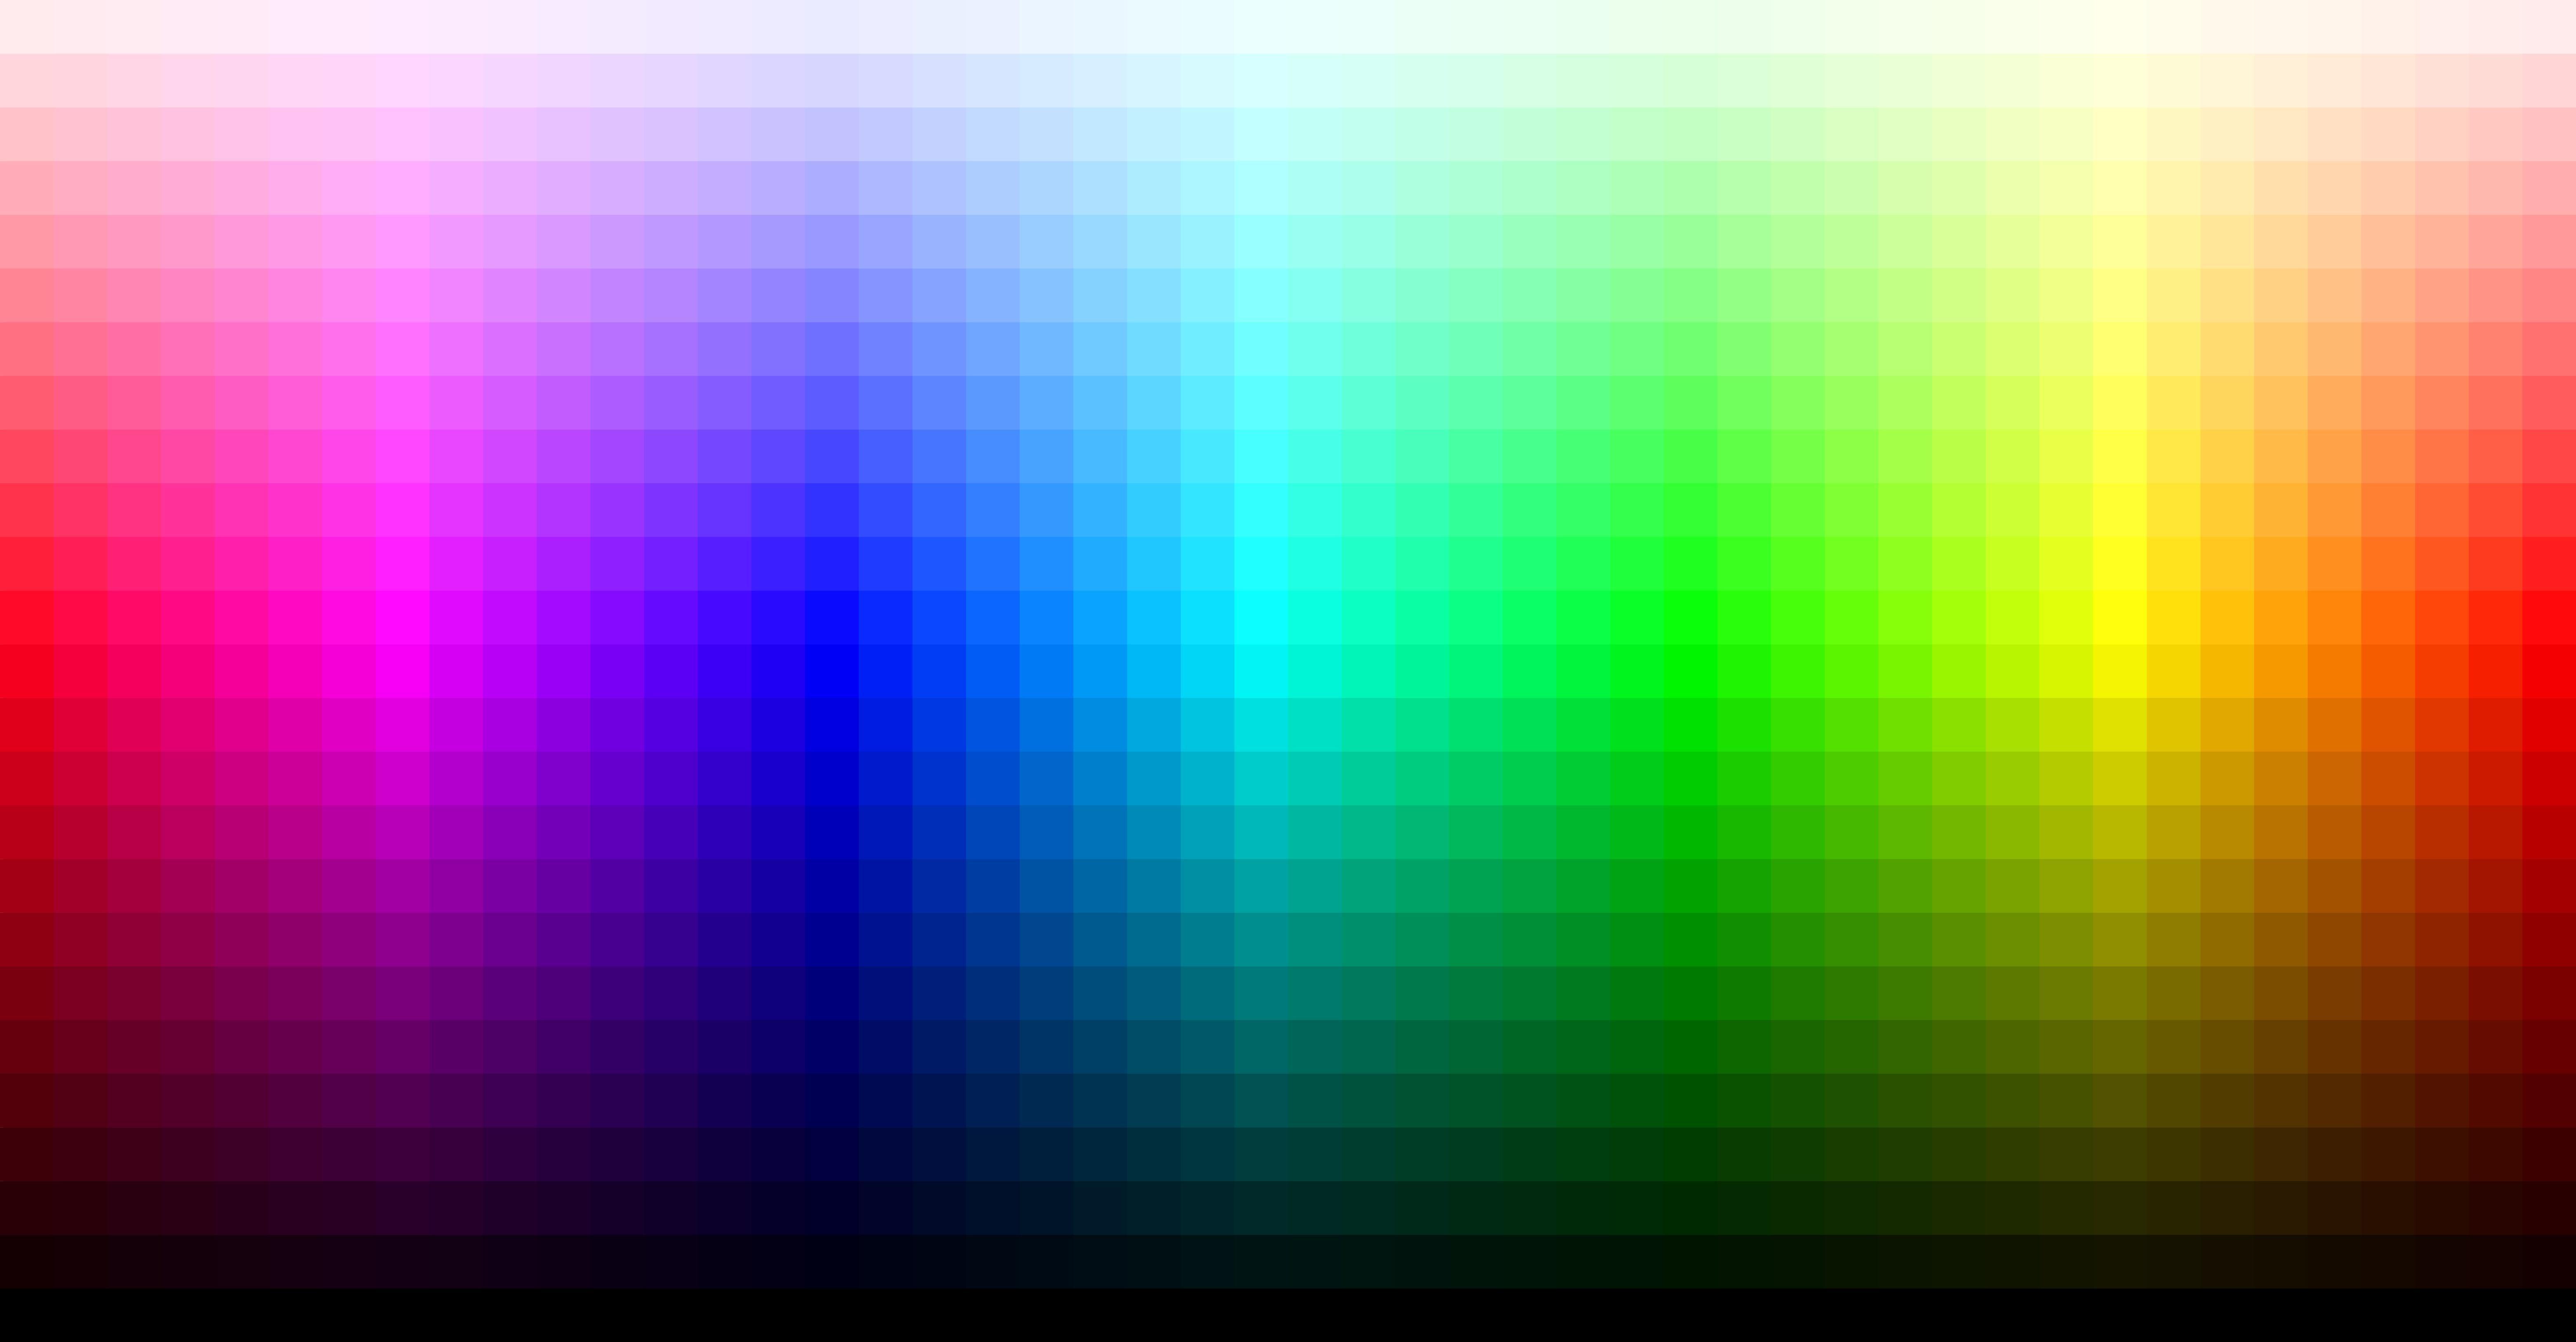 Весь спектр RGB на одной картинке